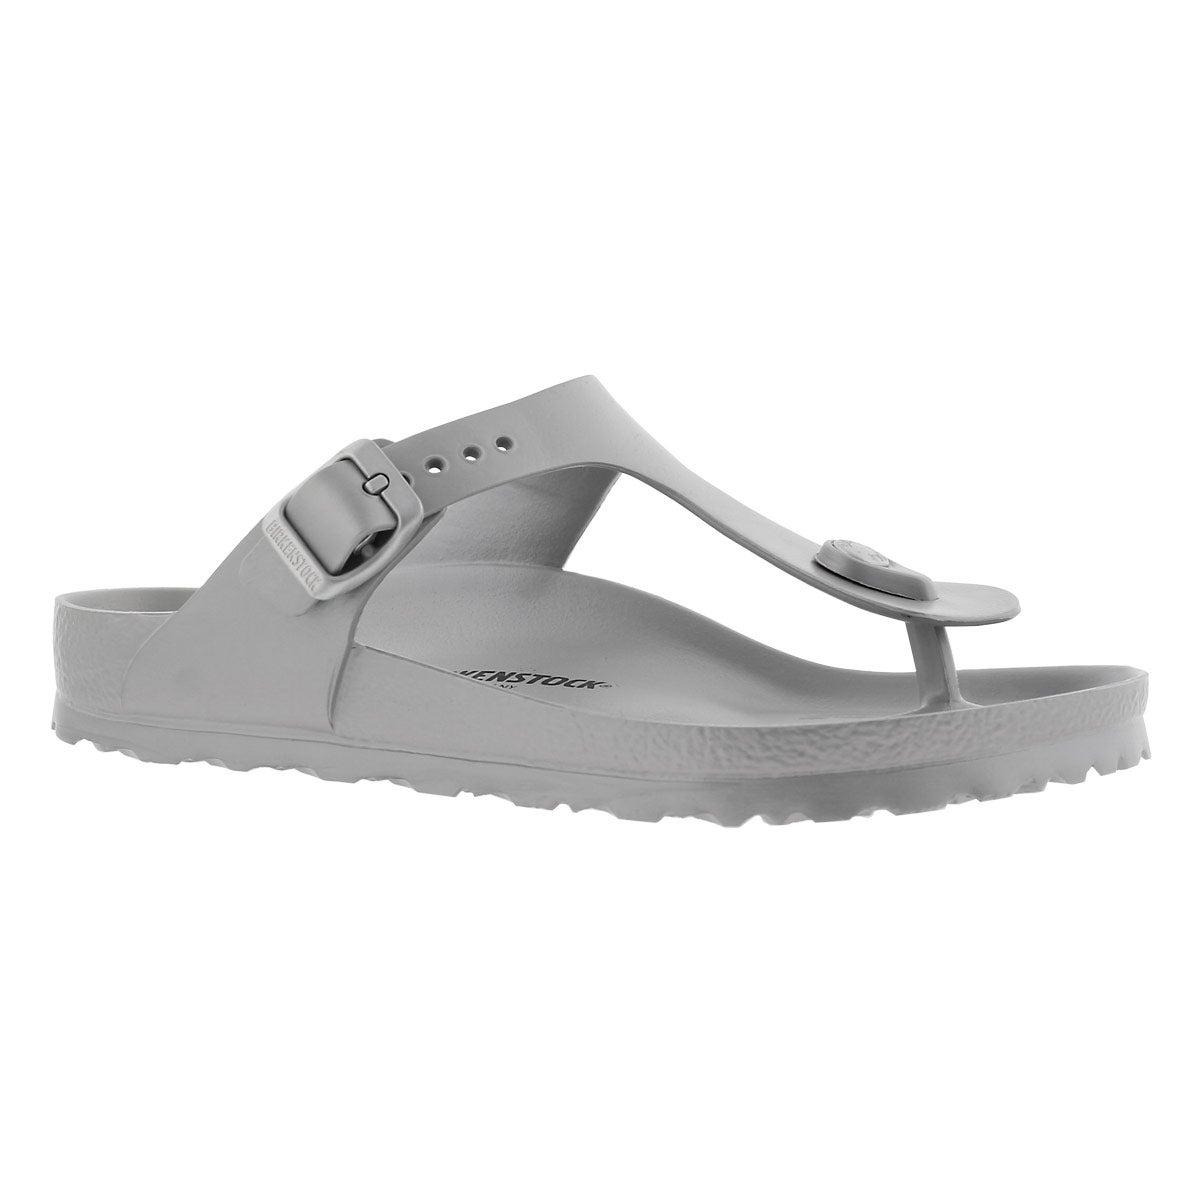 Women's GIZEH metallic silver EVA thong sandals